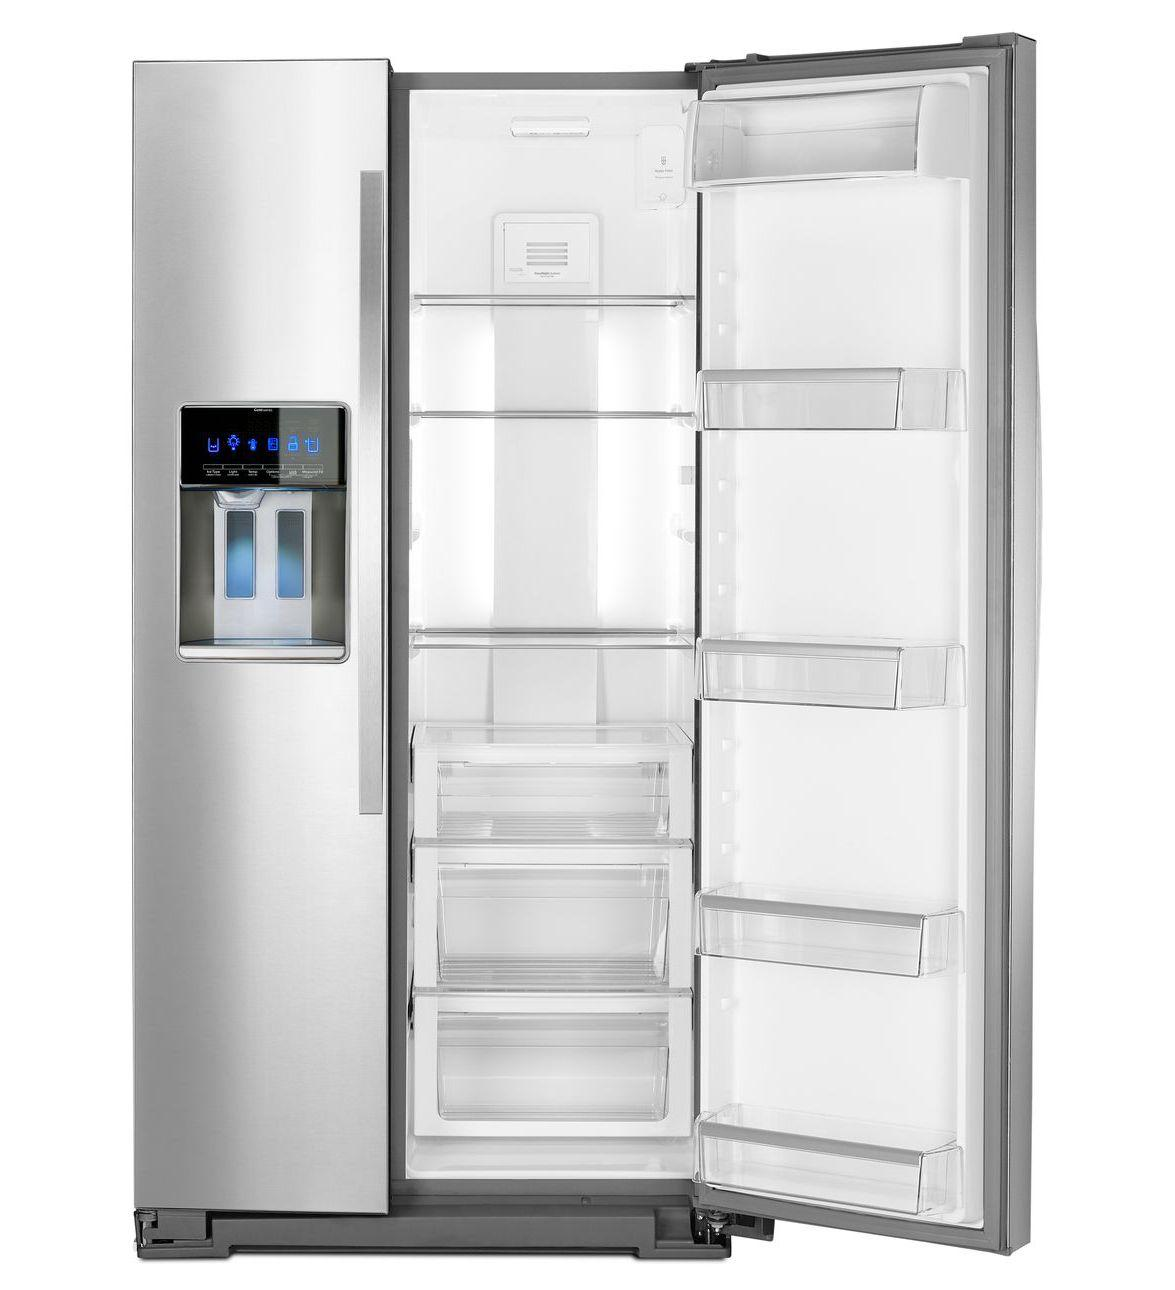 Wrs975sidm Whirlpool Wrs975sidm Side By Side Refrigerators